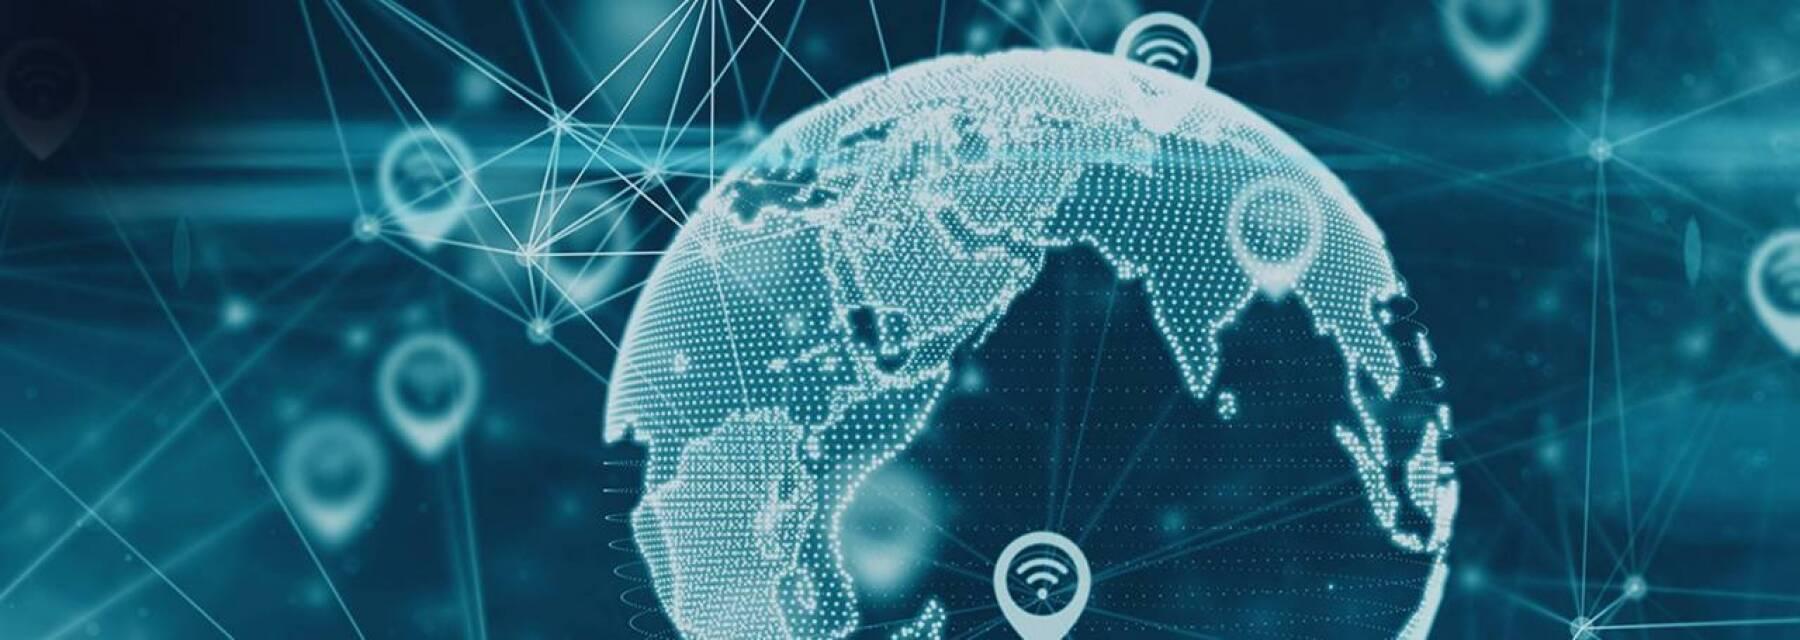 Blockchain app development services india